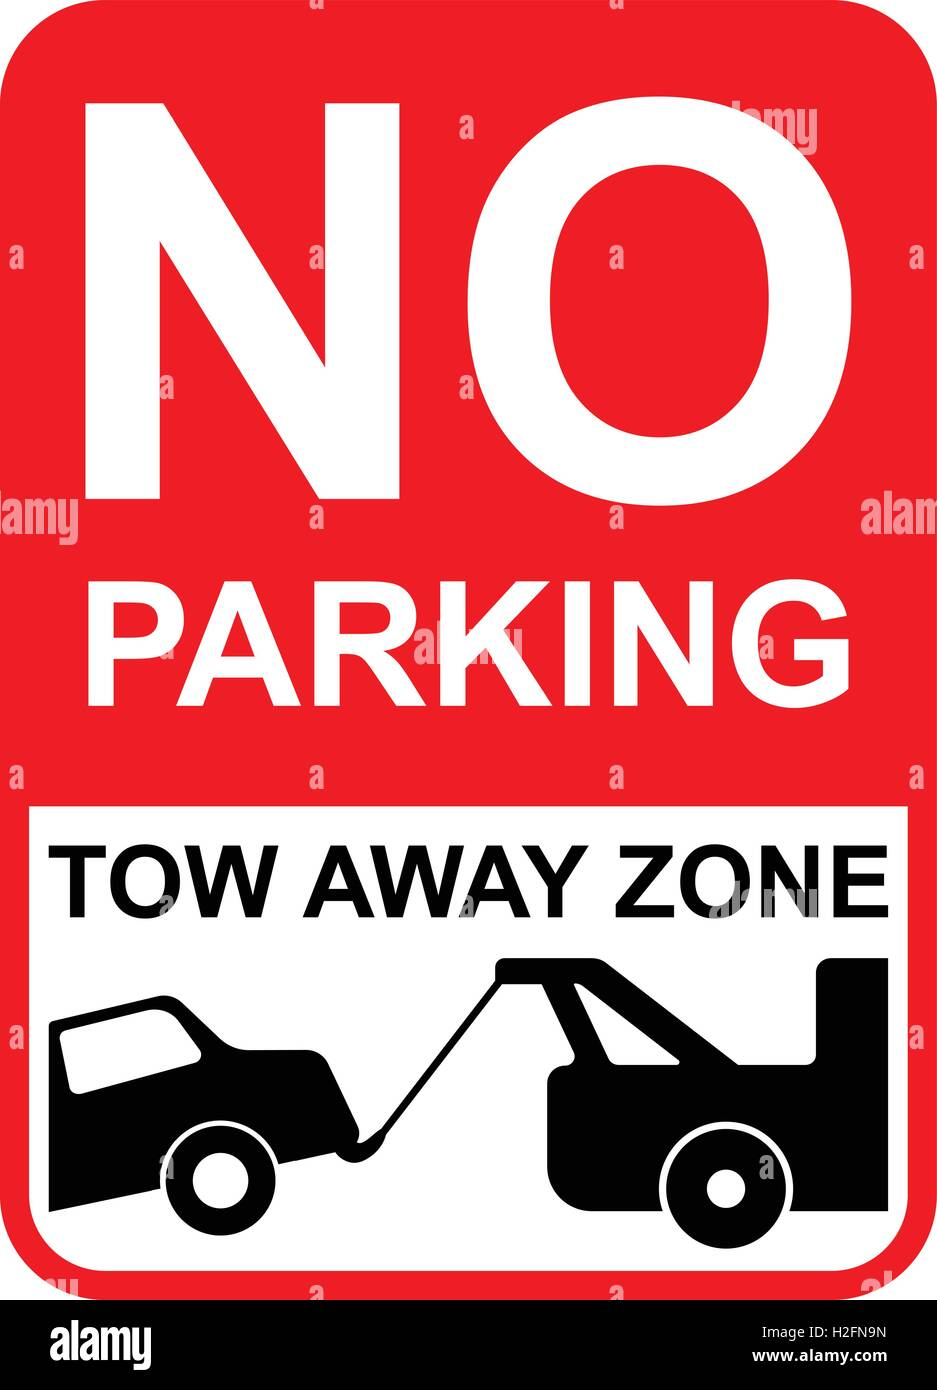 Car Parking Download For Mobile